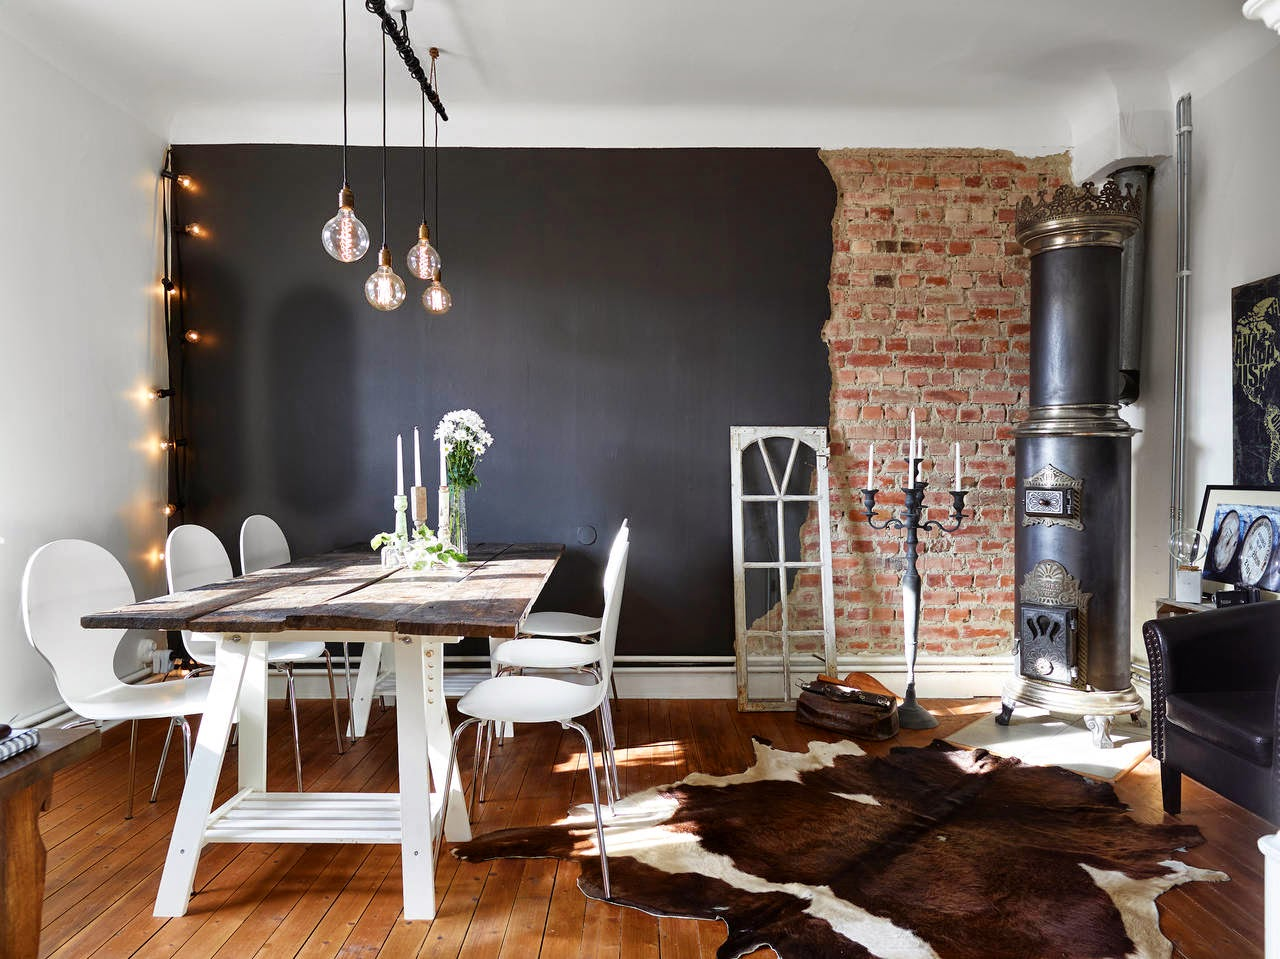 inspiracion-deco-estilo-nordico-estilo-escandinavo-pared-de-ladrillo-casa-nordica-salon-diseno